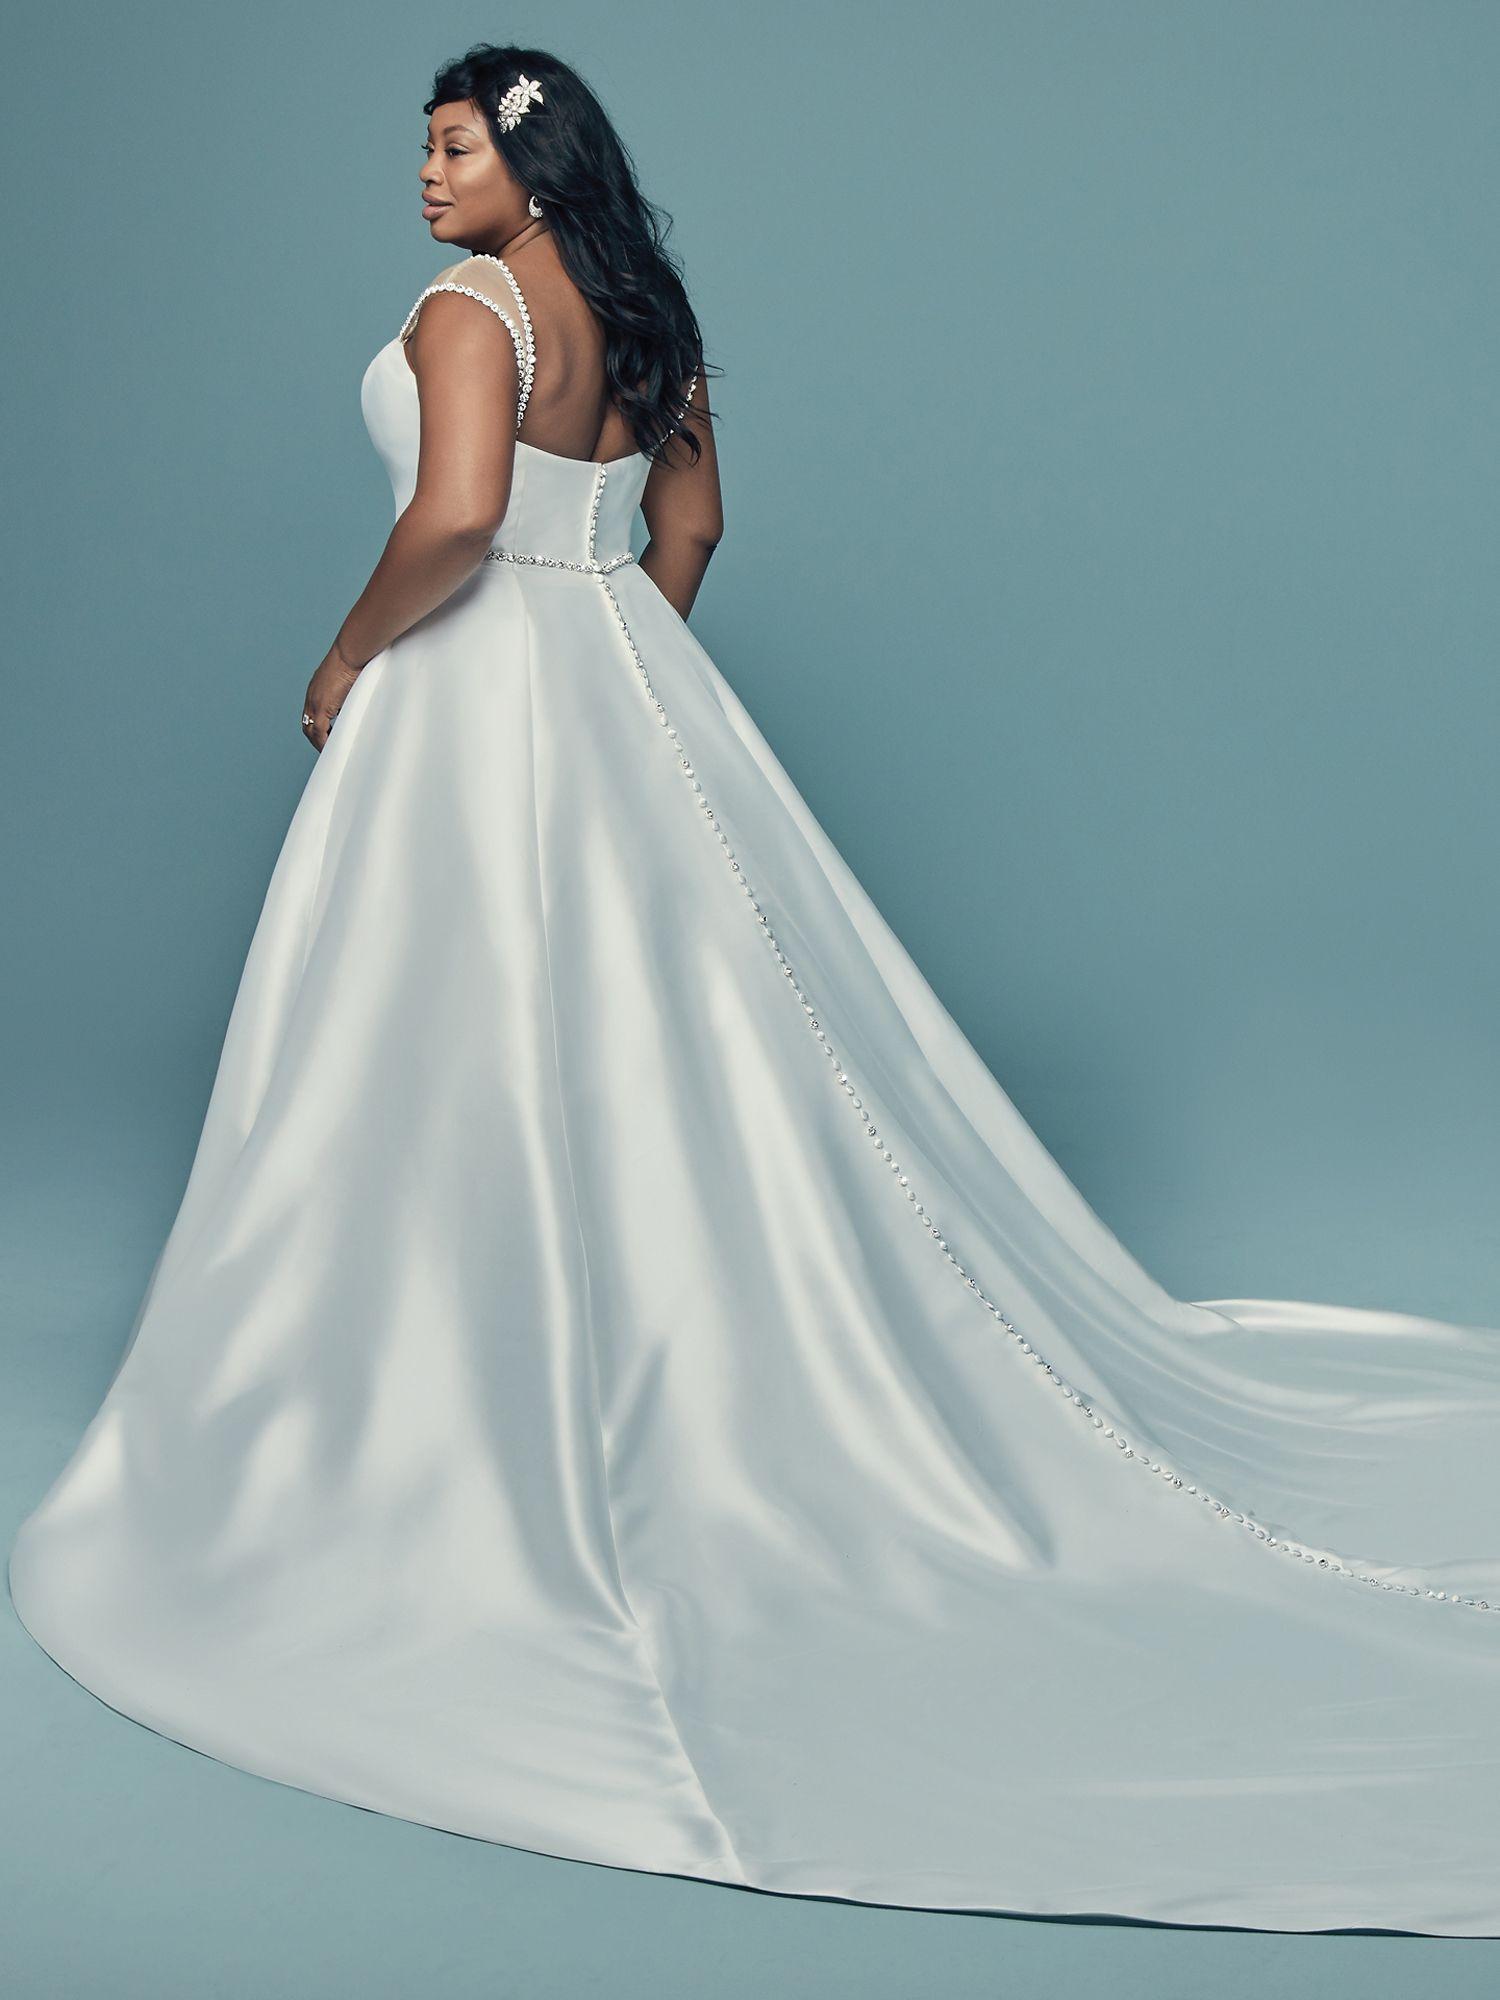 Plus size wedding dresses for curvy brides Wedding